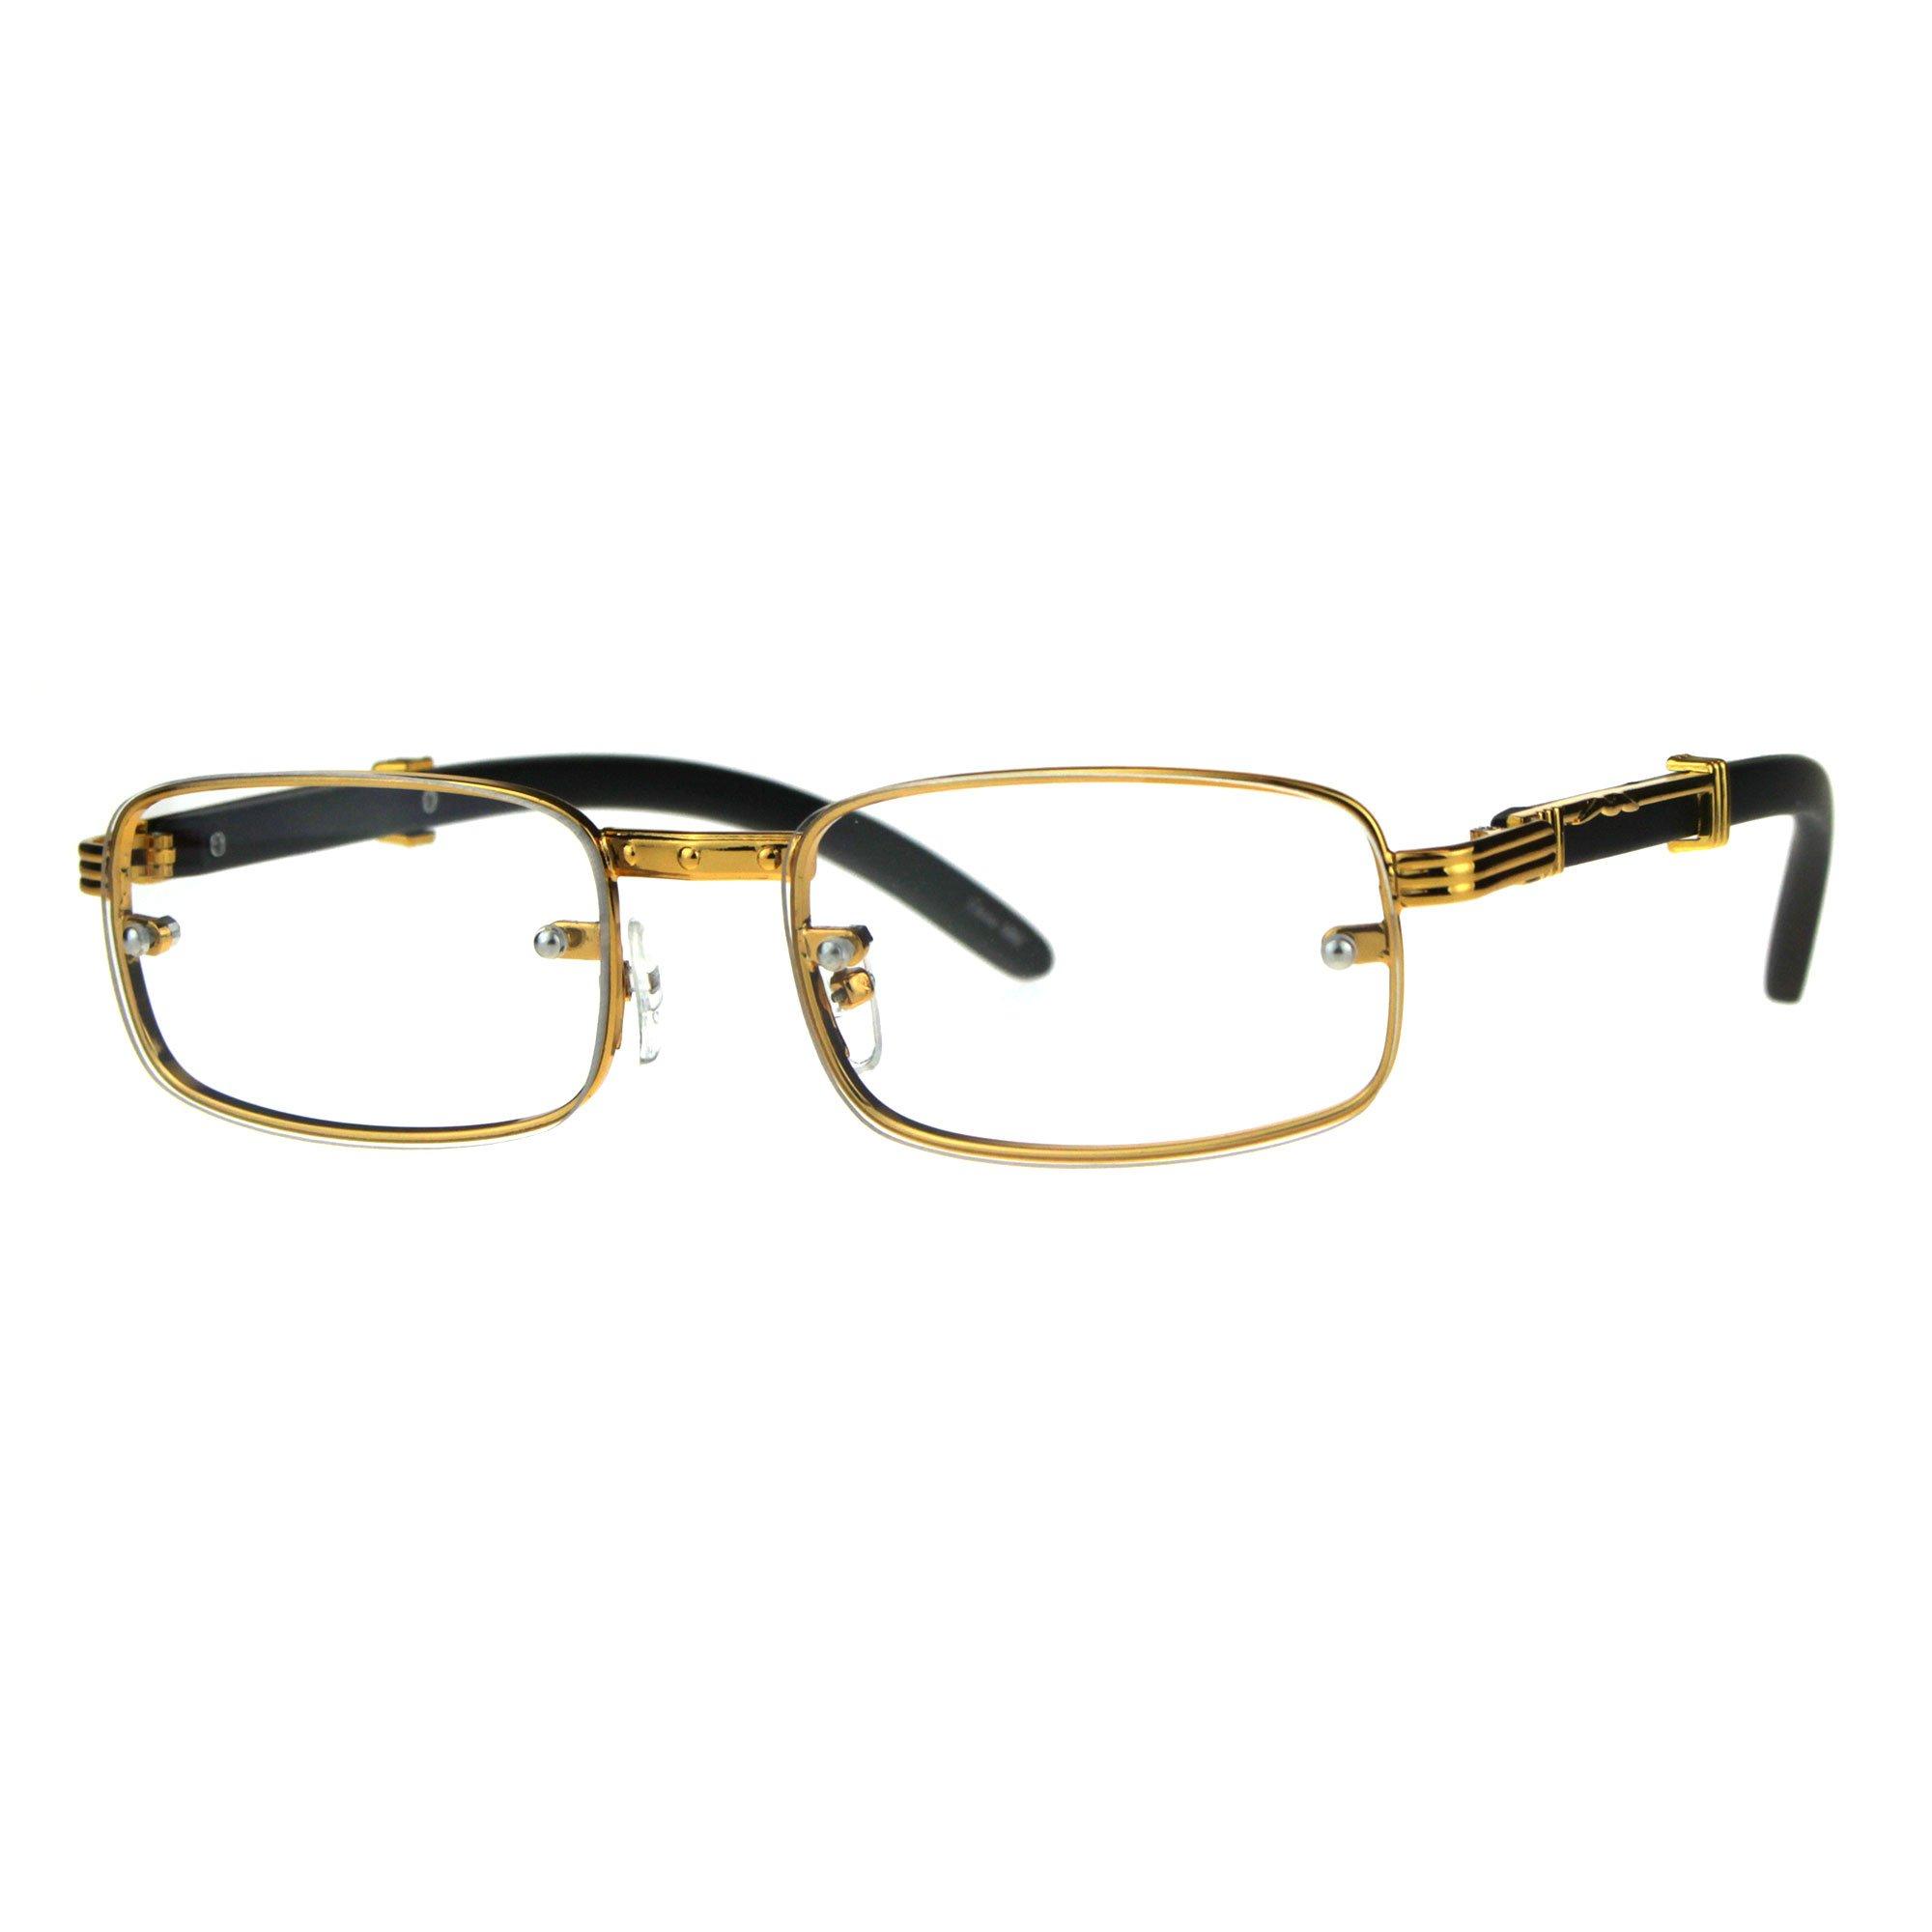 SA106 Art Nouveau Vintage Style Oval Metal Frame Eye Glasses Exposed Lens Yellow Gold